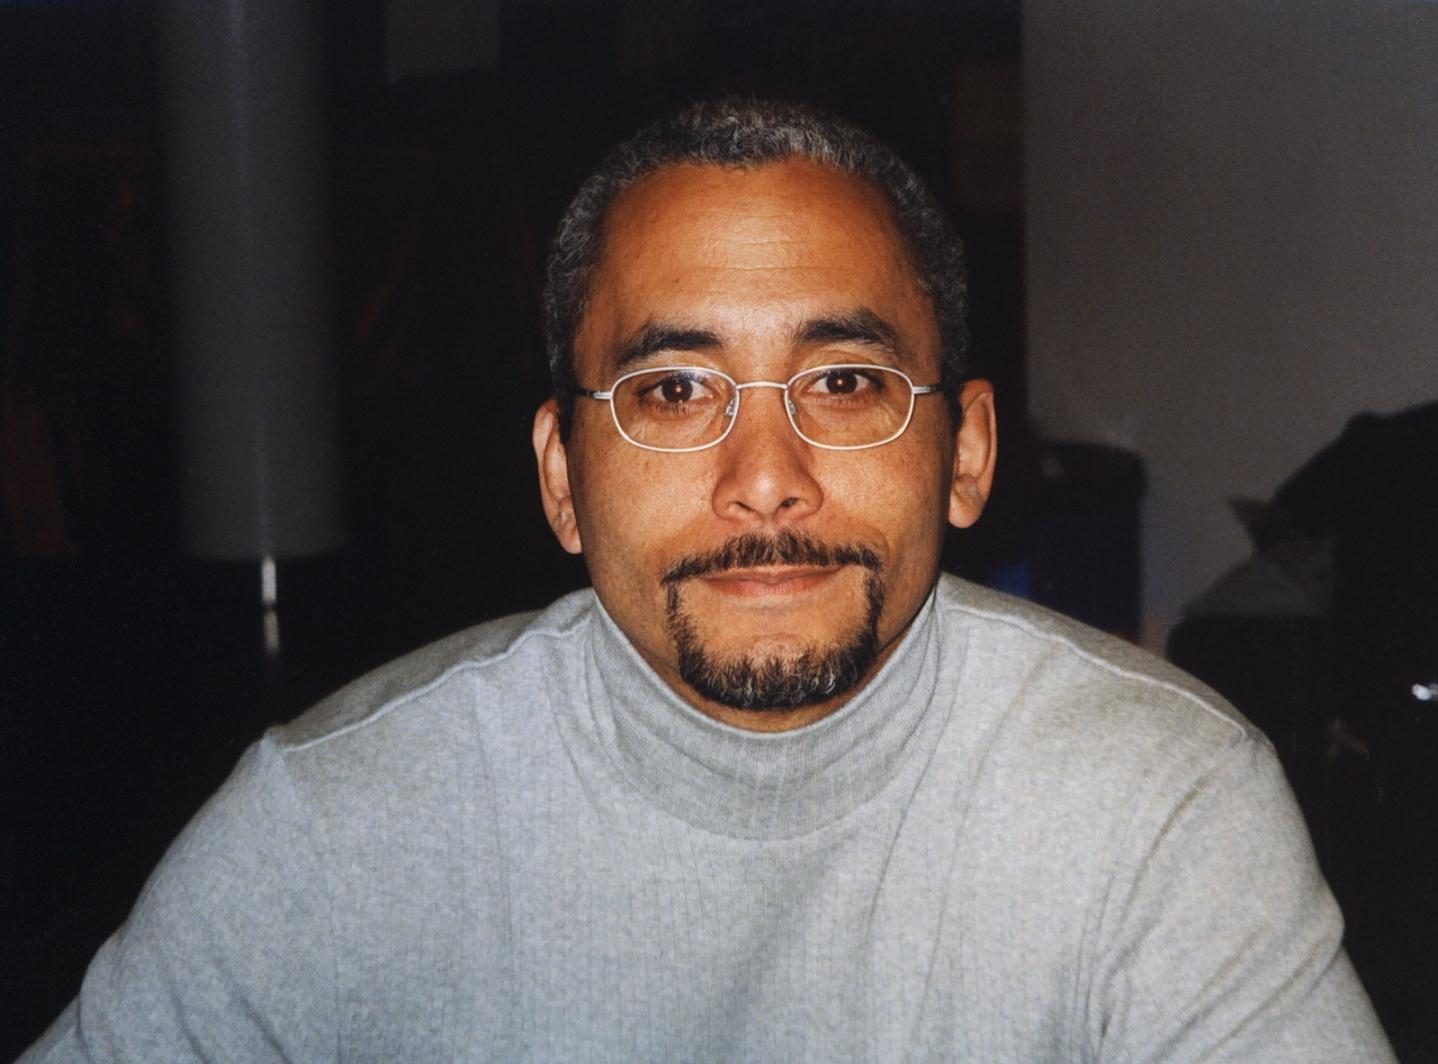 File:Richard Biggs.jpg - Wikipedia